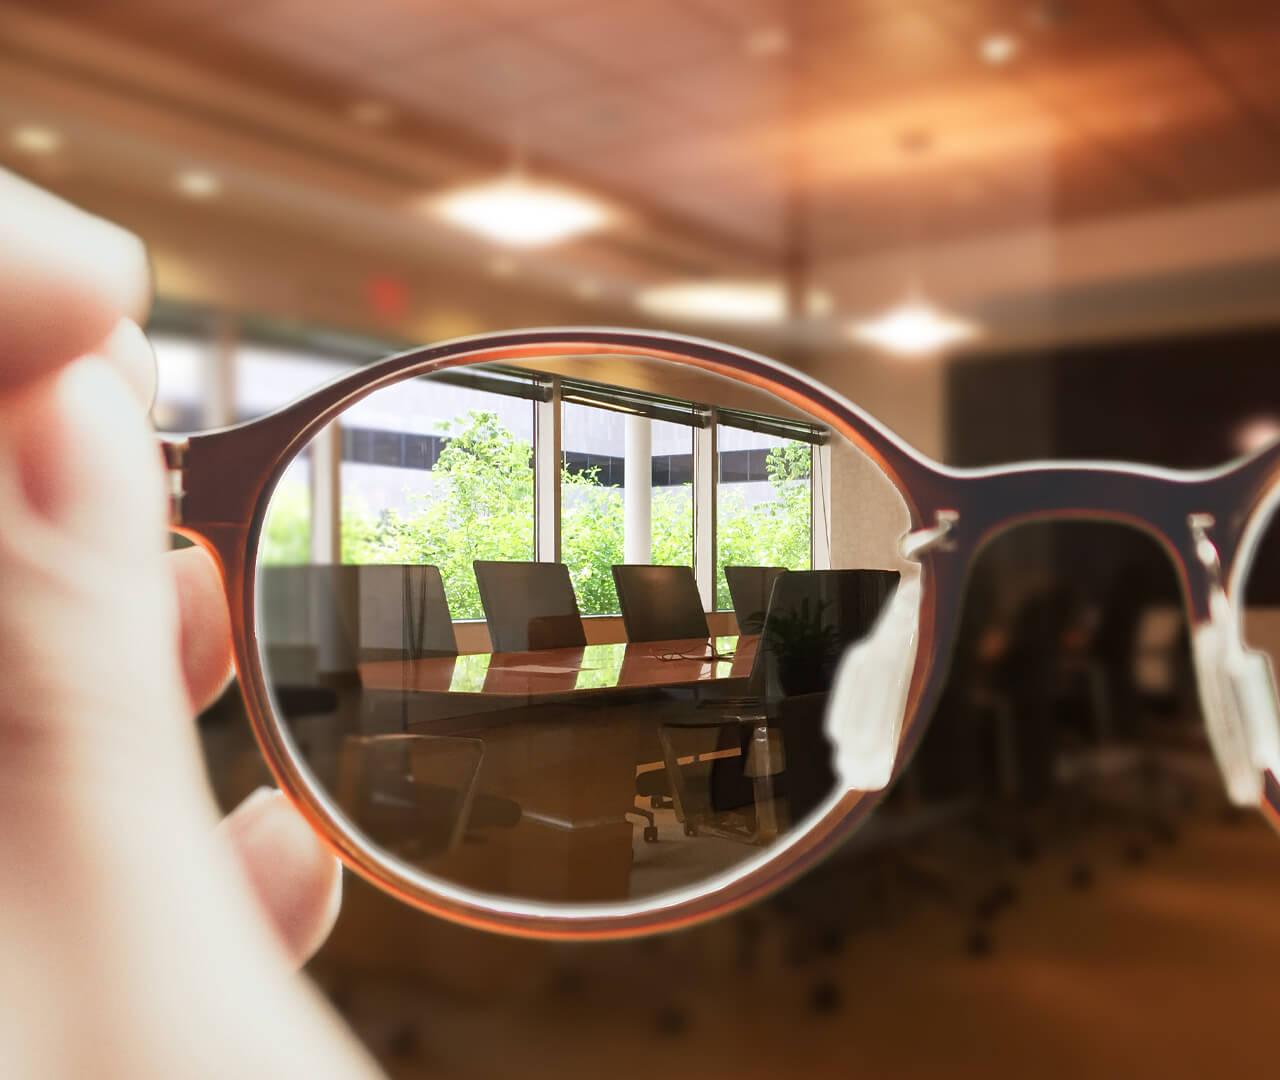 Bringing Internal Communications into Focus with an External PR Lens